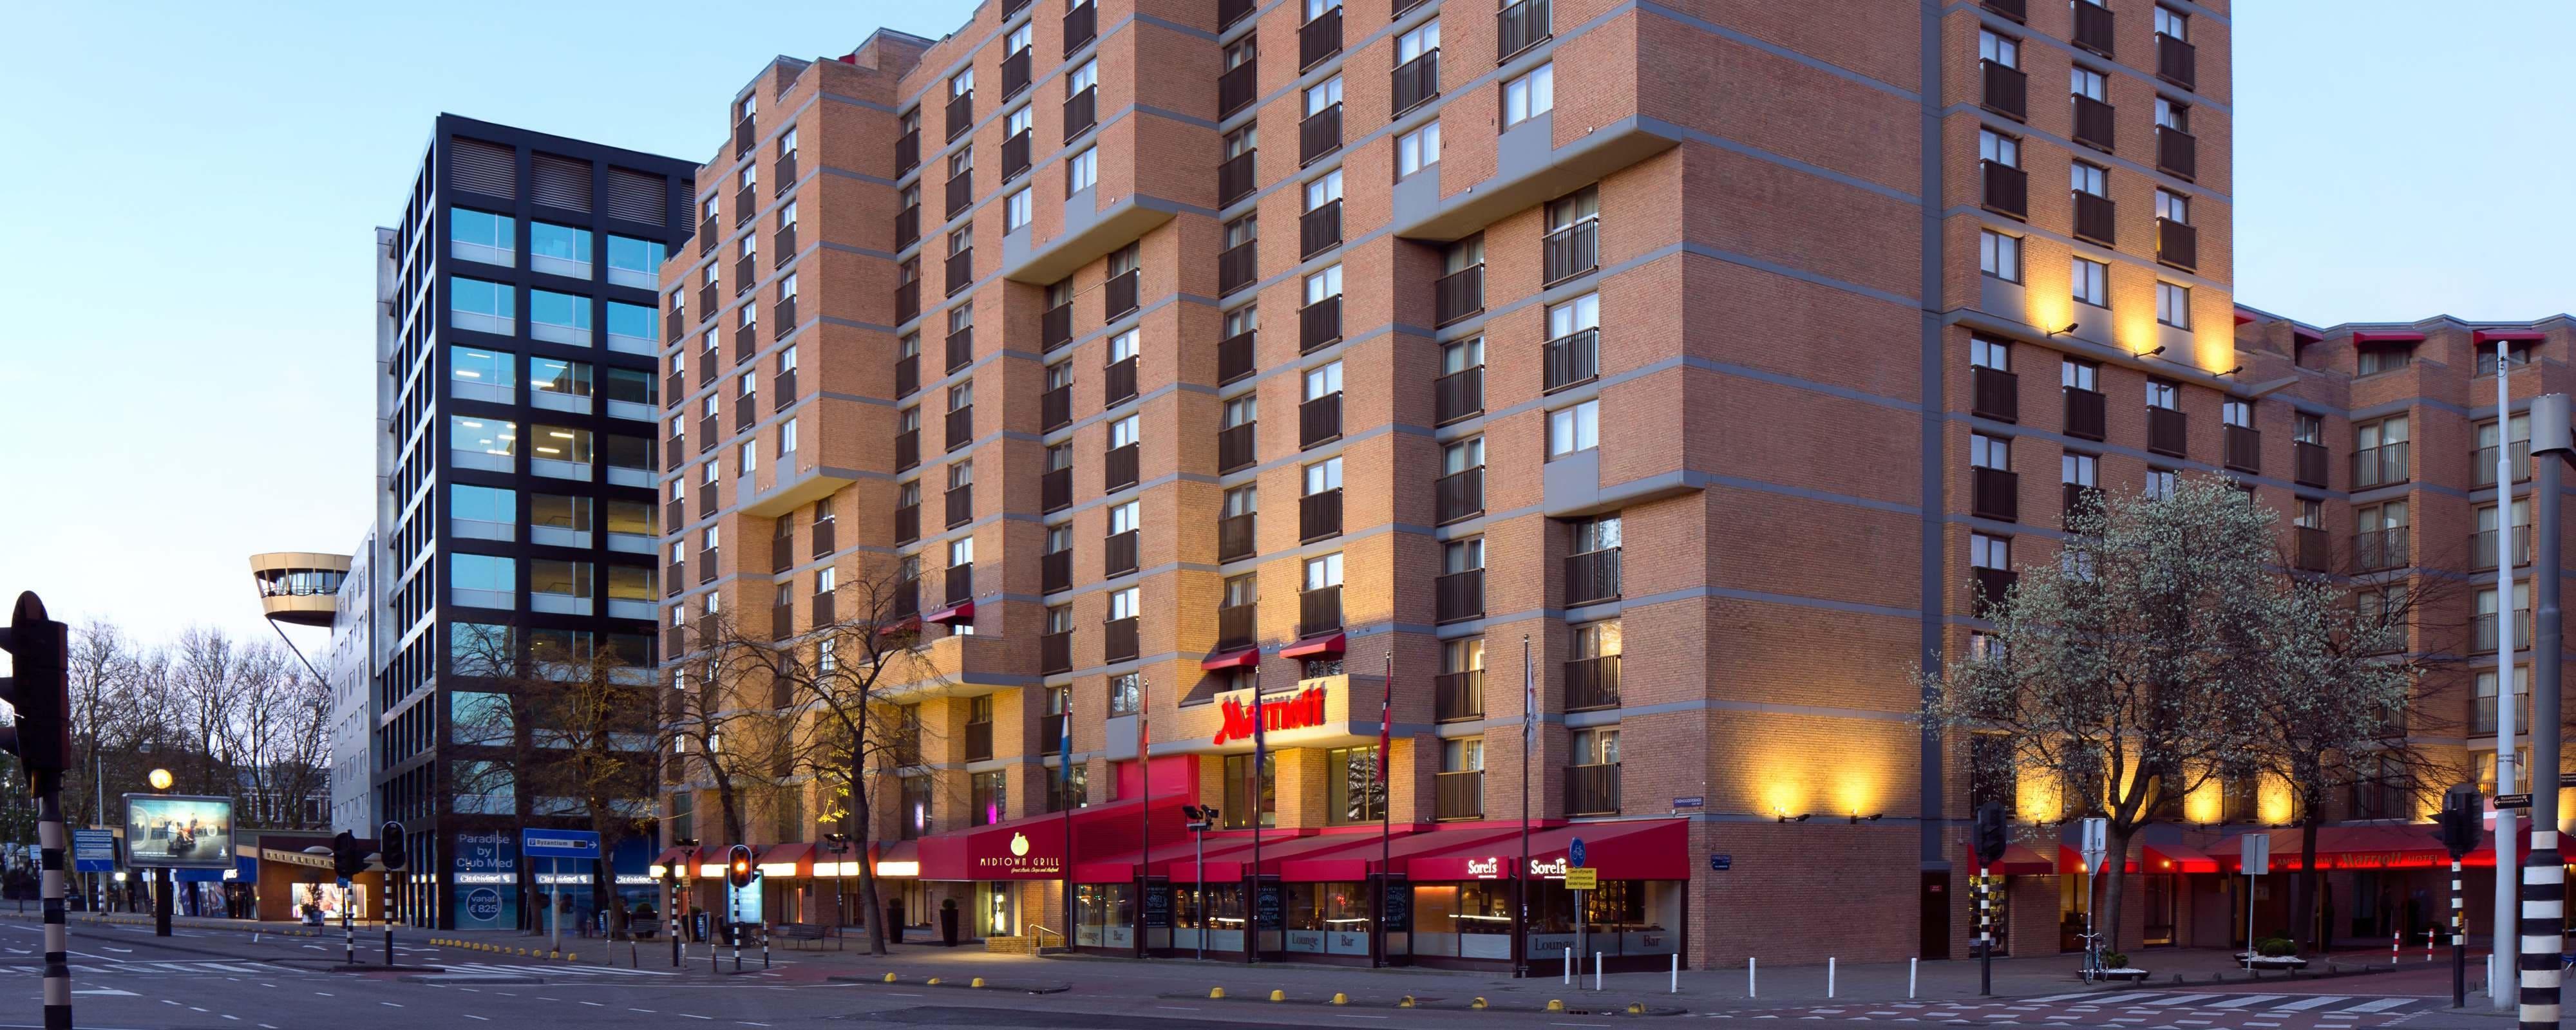 City Centre Hotel In Amsterdam Netherlands Amsterdam